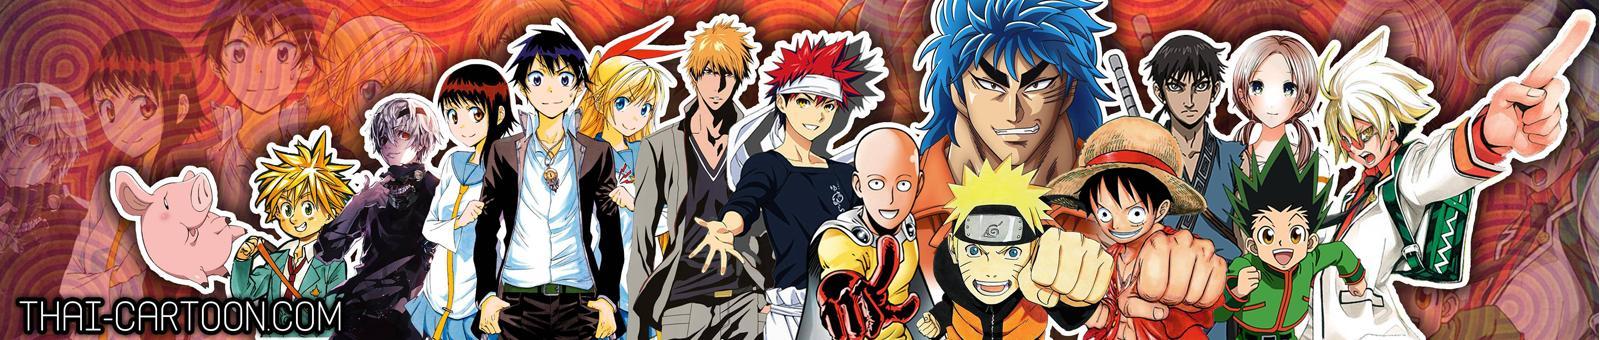 Solo Leveling Manga - อ่าน Solo Leveling แปลไทย